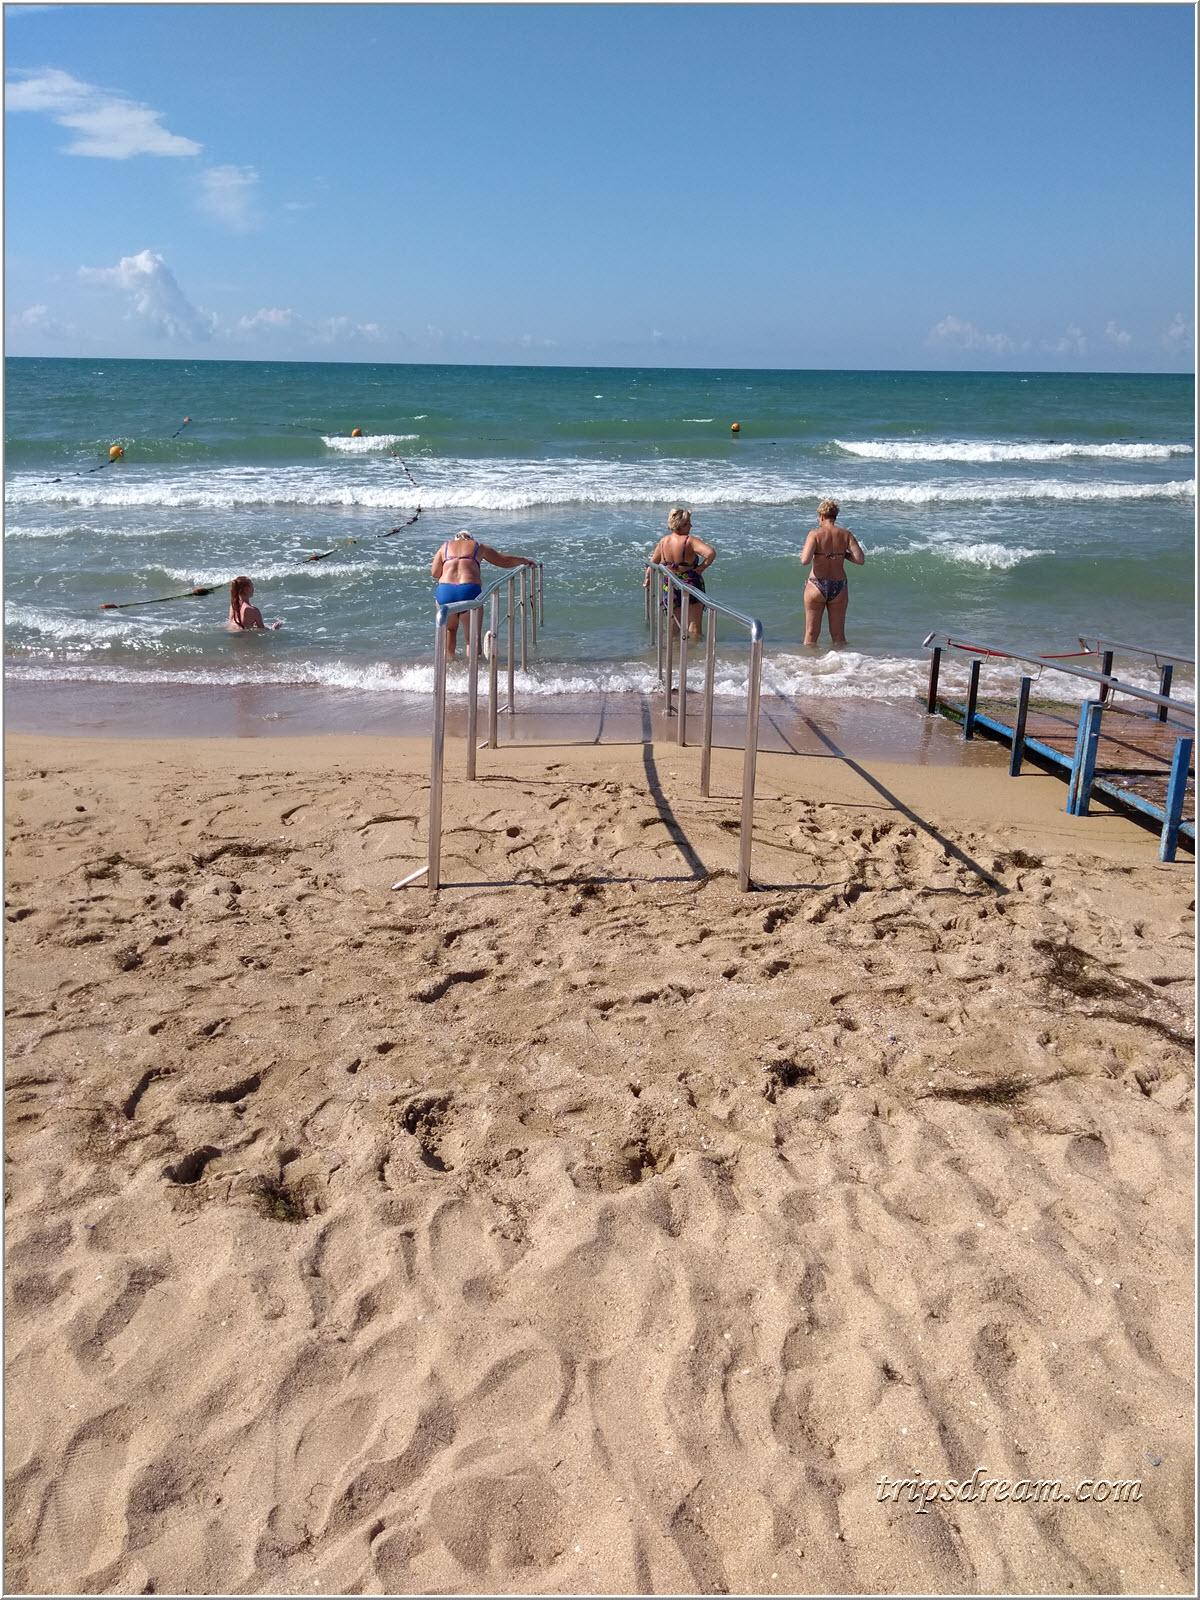 Поручни для входа в море на пляже в Евпатории